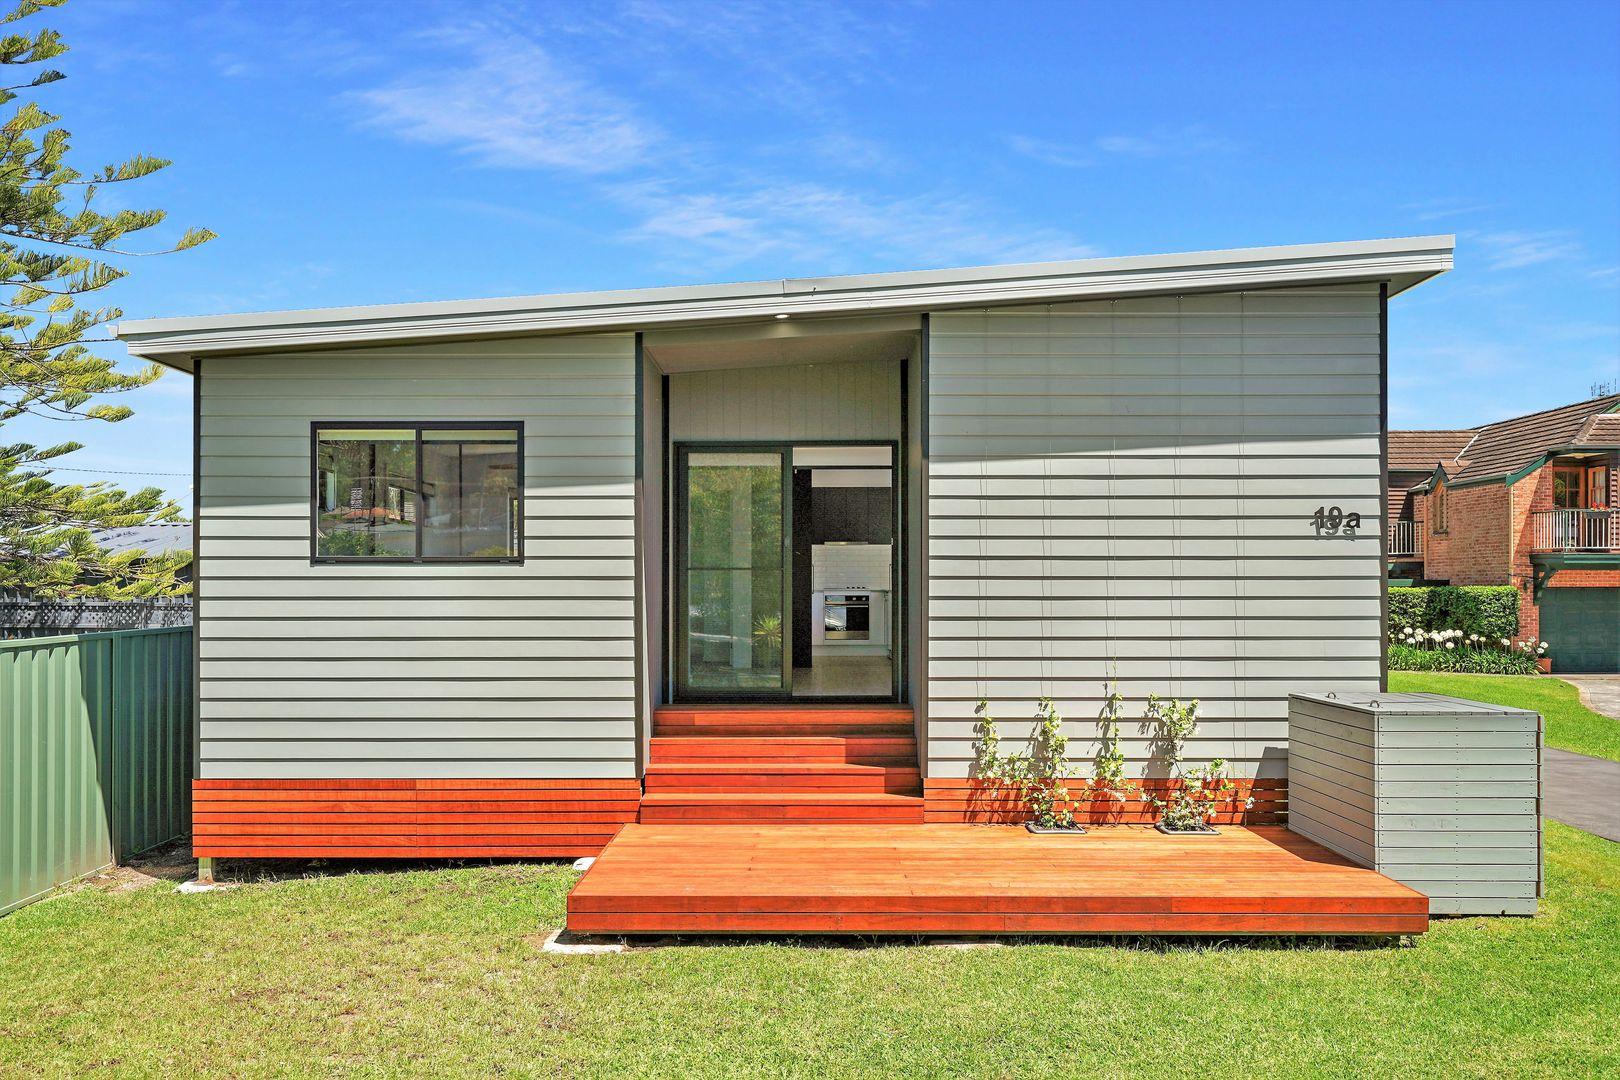 19a Mundoora Ave, Yattalunga NSW 2251, Image 0